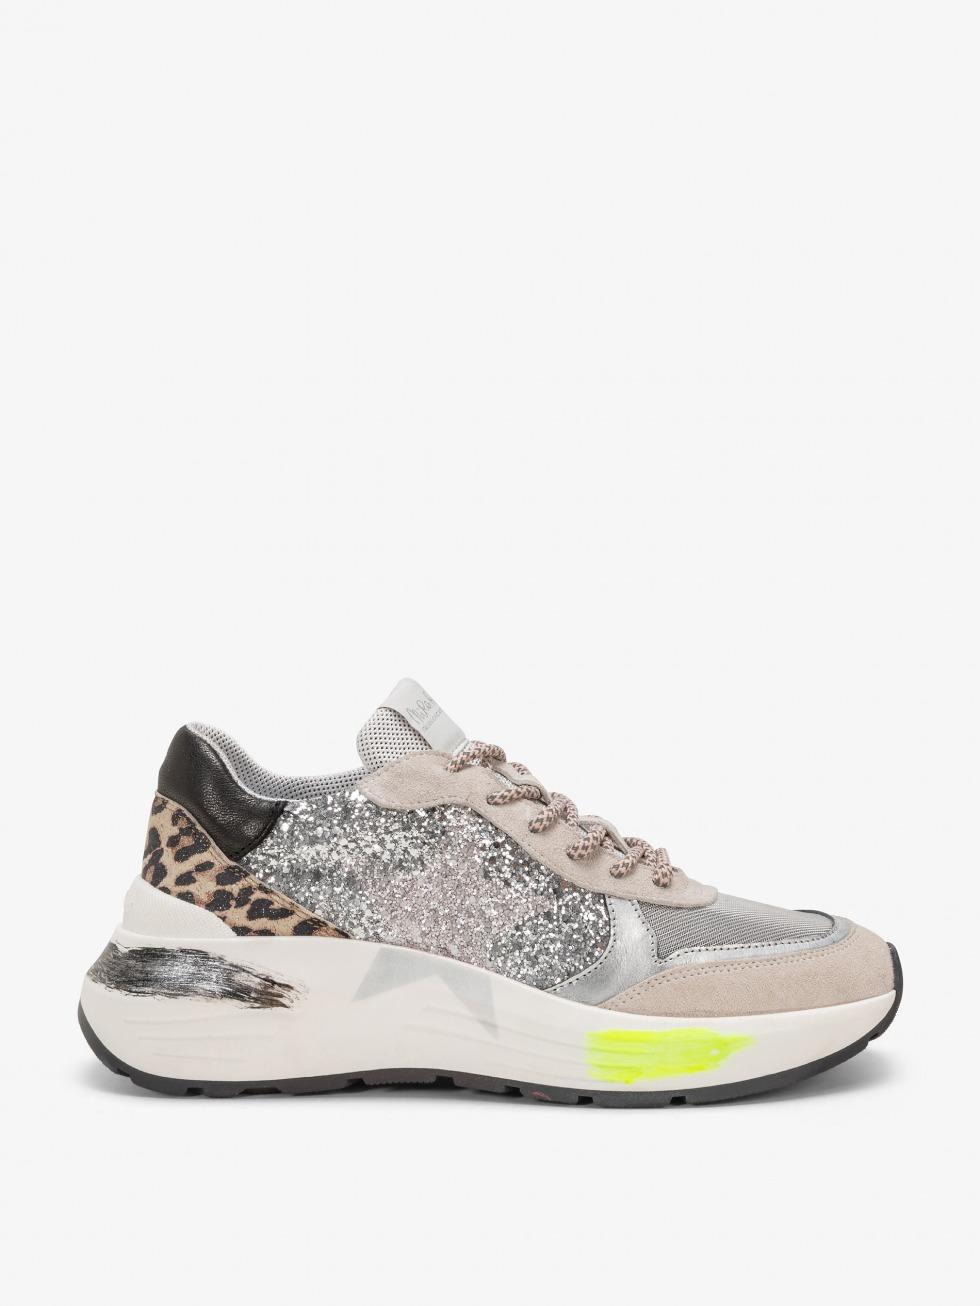 Stinger Chunky Sneakers Urban Jungle - Star